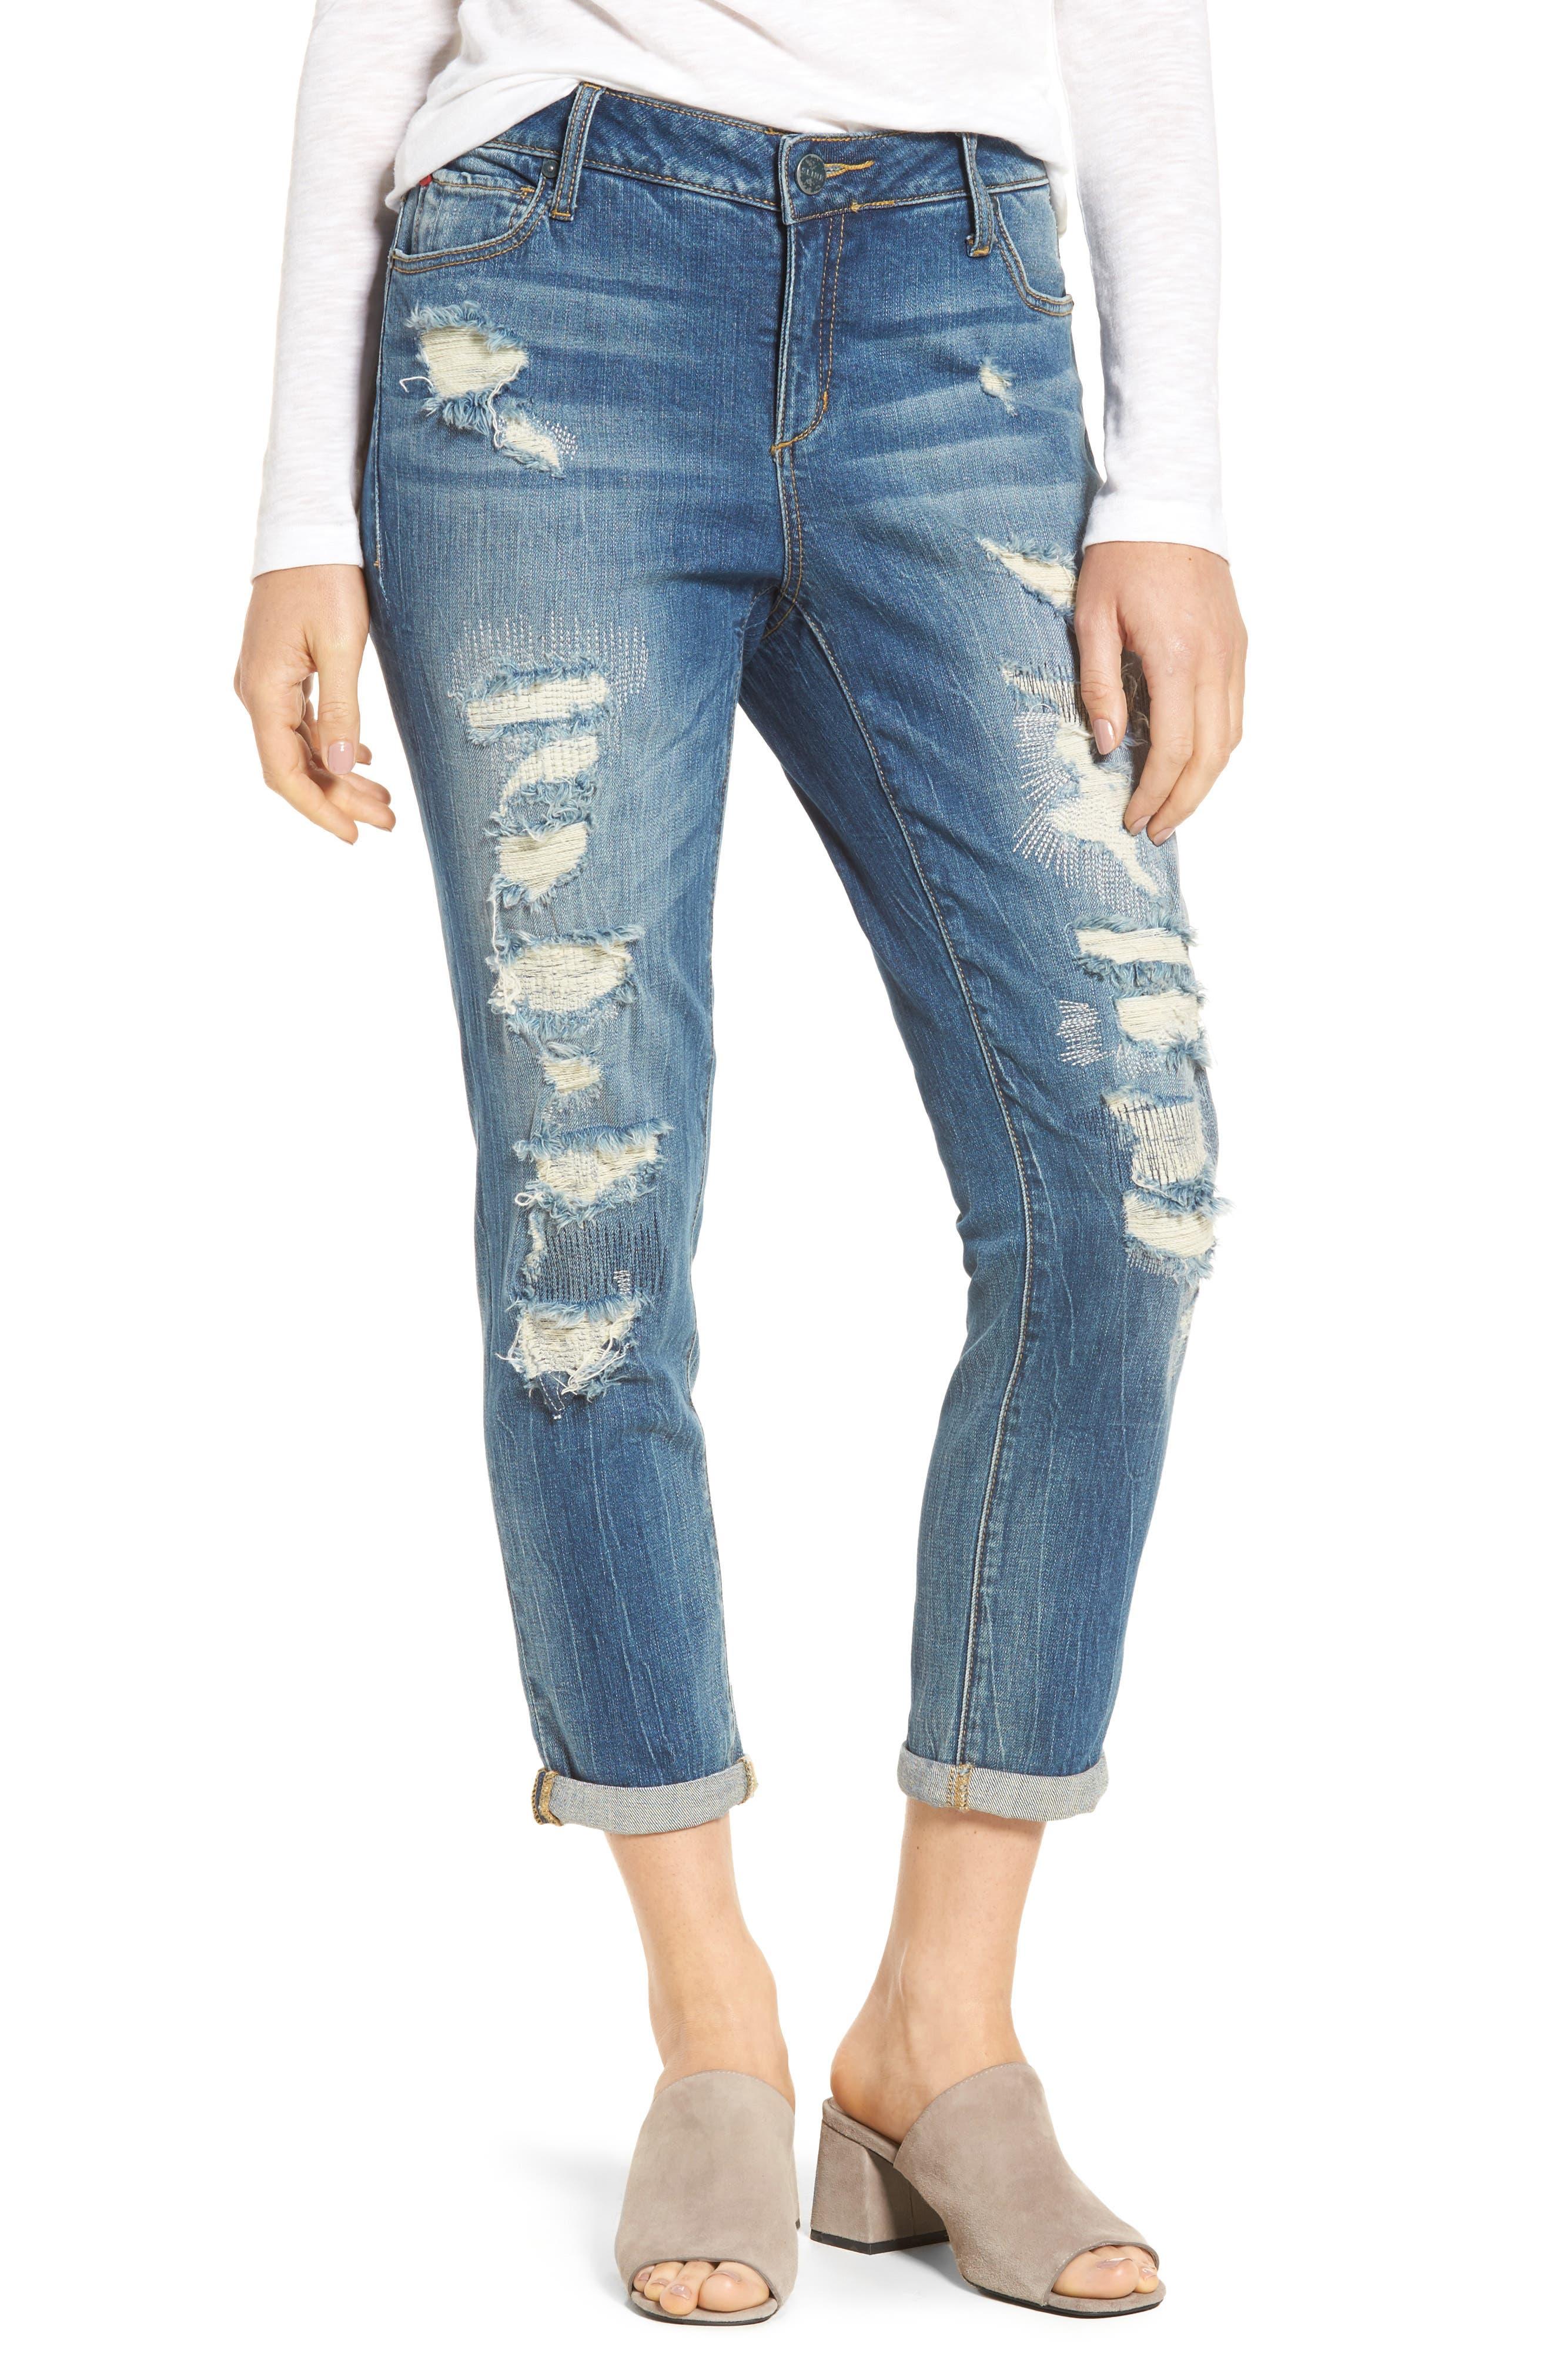 Alternate Image 1 Selected - SLINK Jeans Distressed Ankle Boyfriend Jeans (Chelsea)